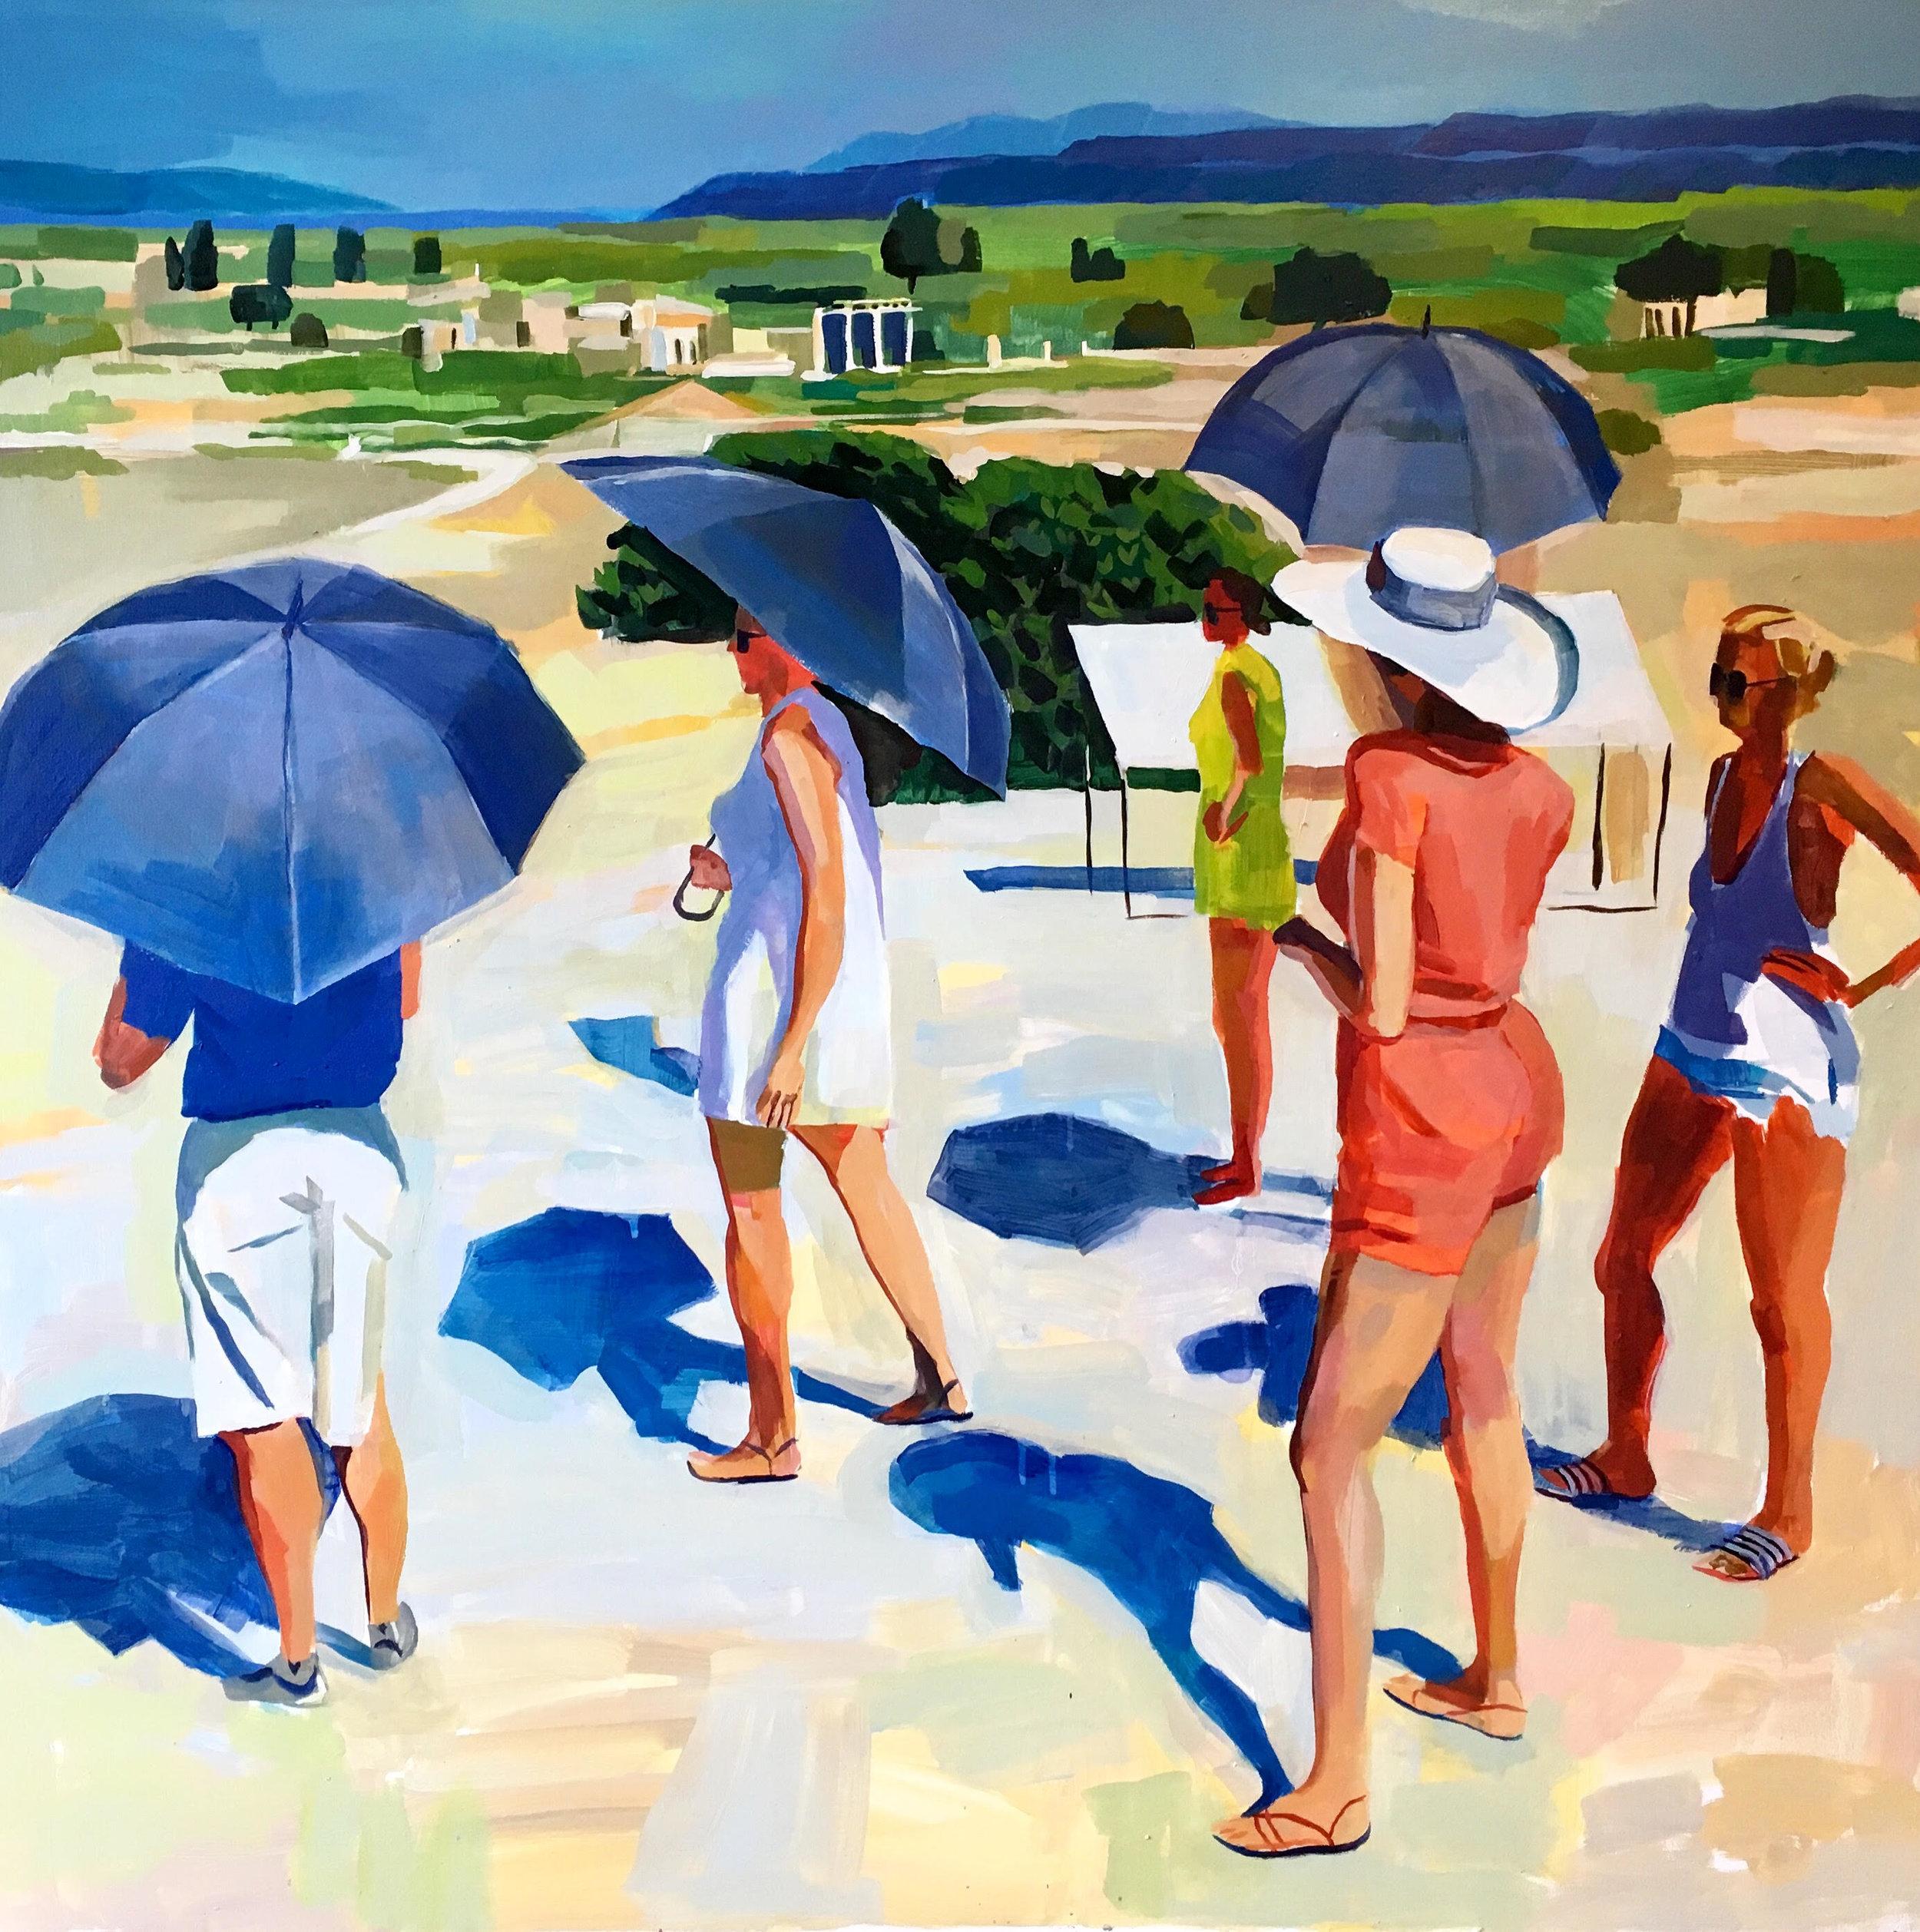 Tourists by Erica Lamberson